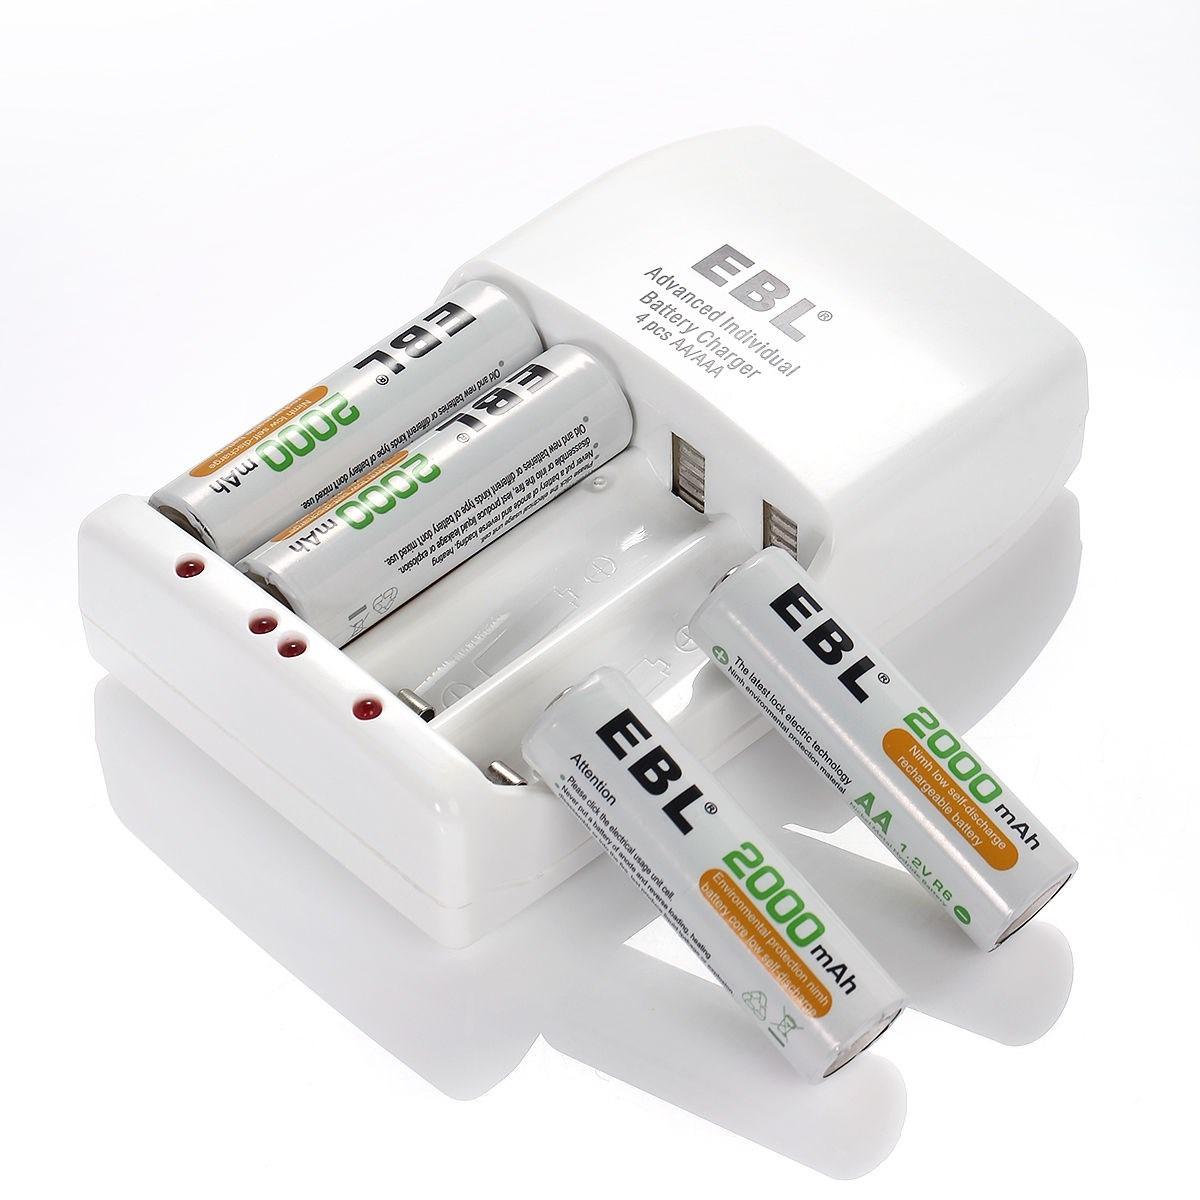 4 pilas baterias recargables aa 2000mah cargador ebl - Cargador pilas recargables ...